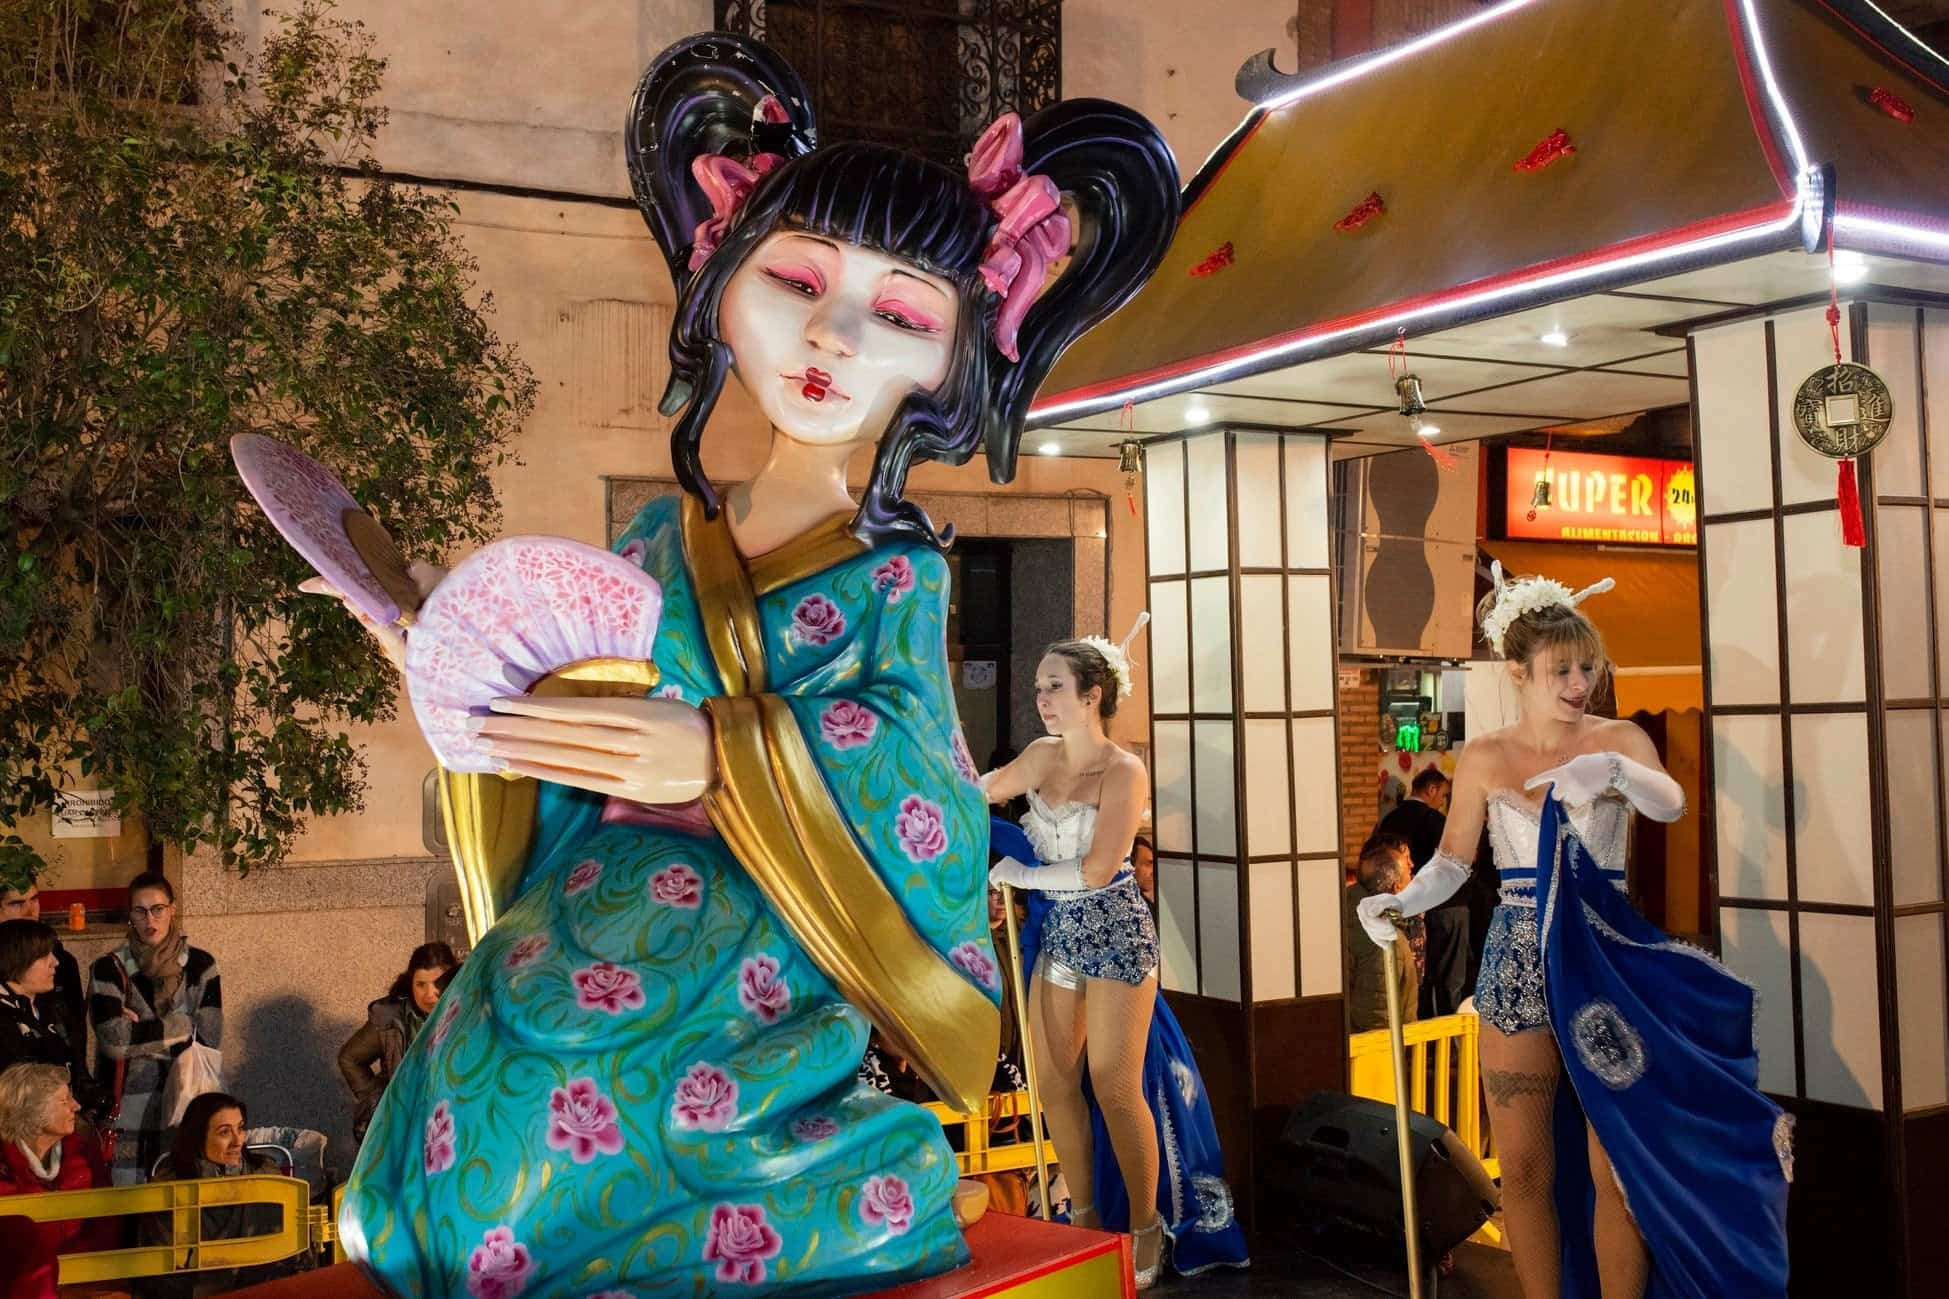 Carnaval de herencia 2020 ofertorio 134 - Selección de fotografías del Ofertorio del Carnaval de Herencia